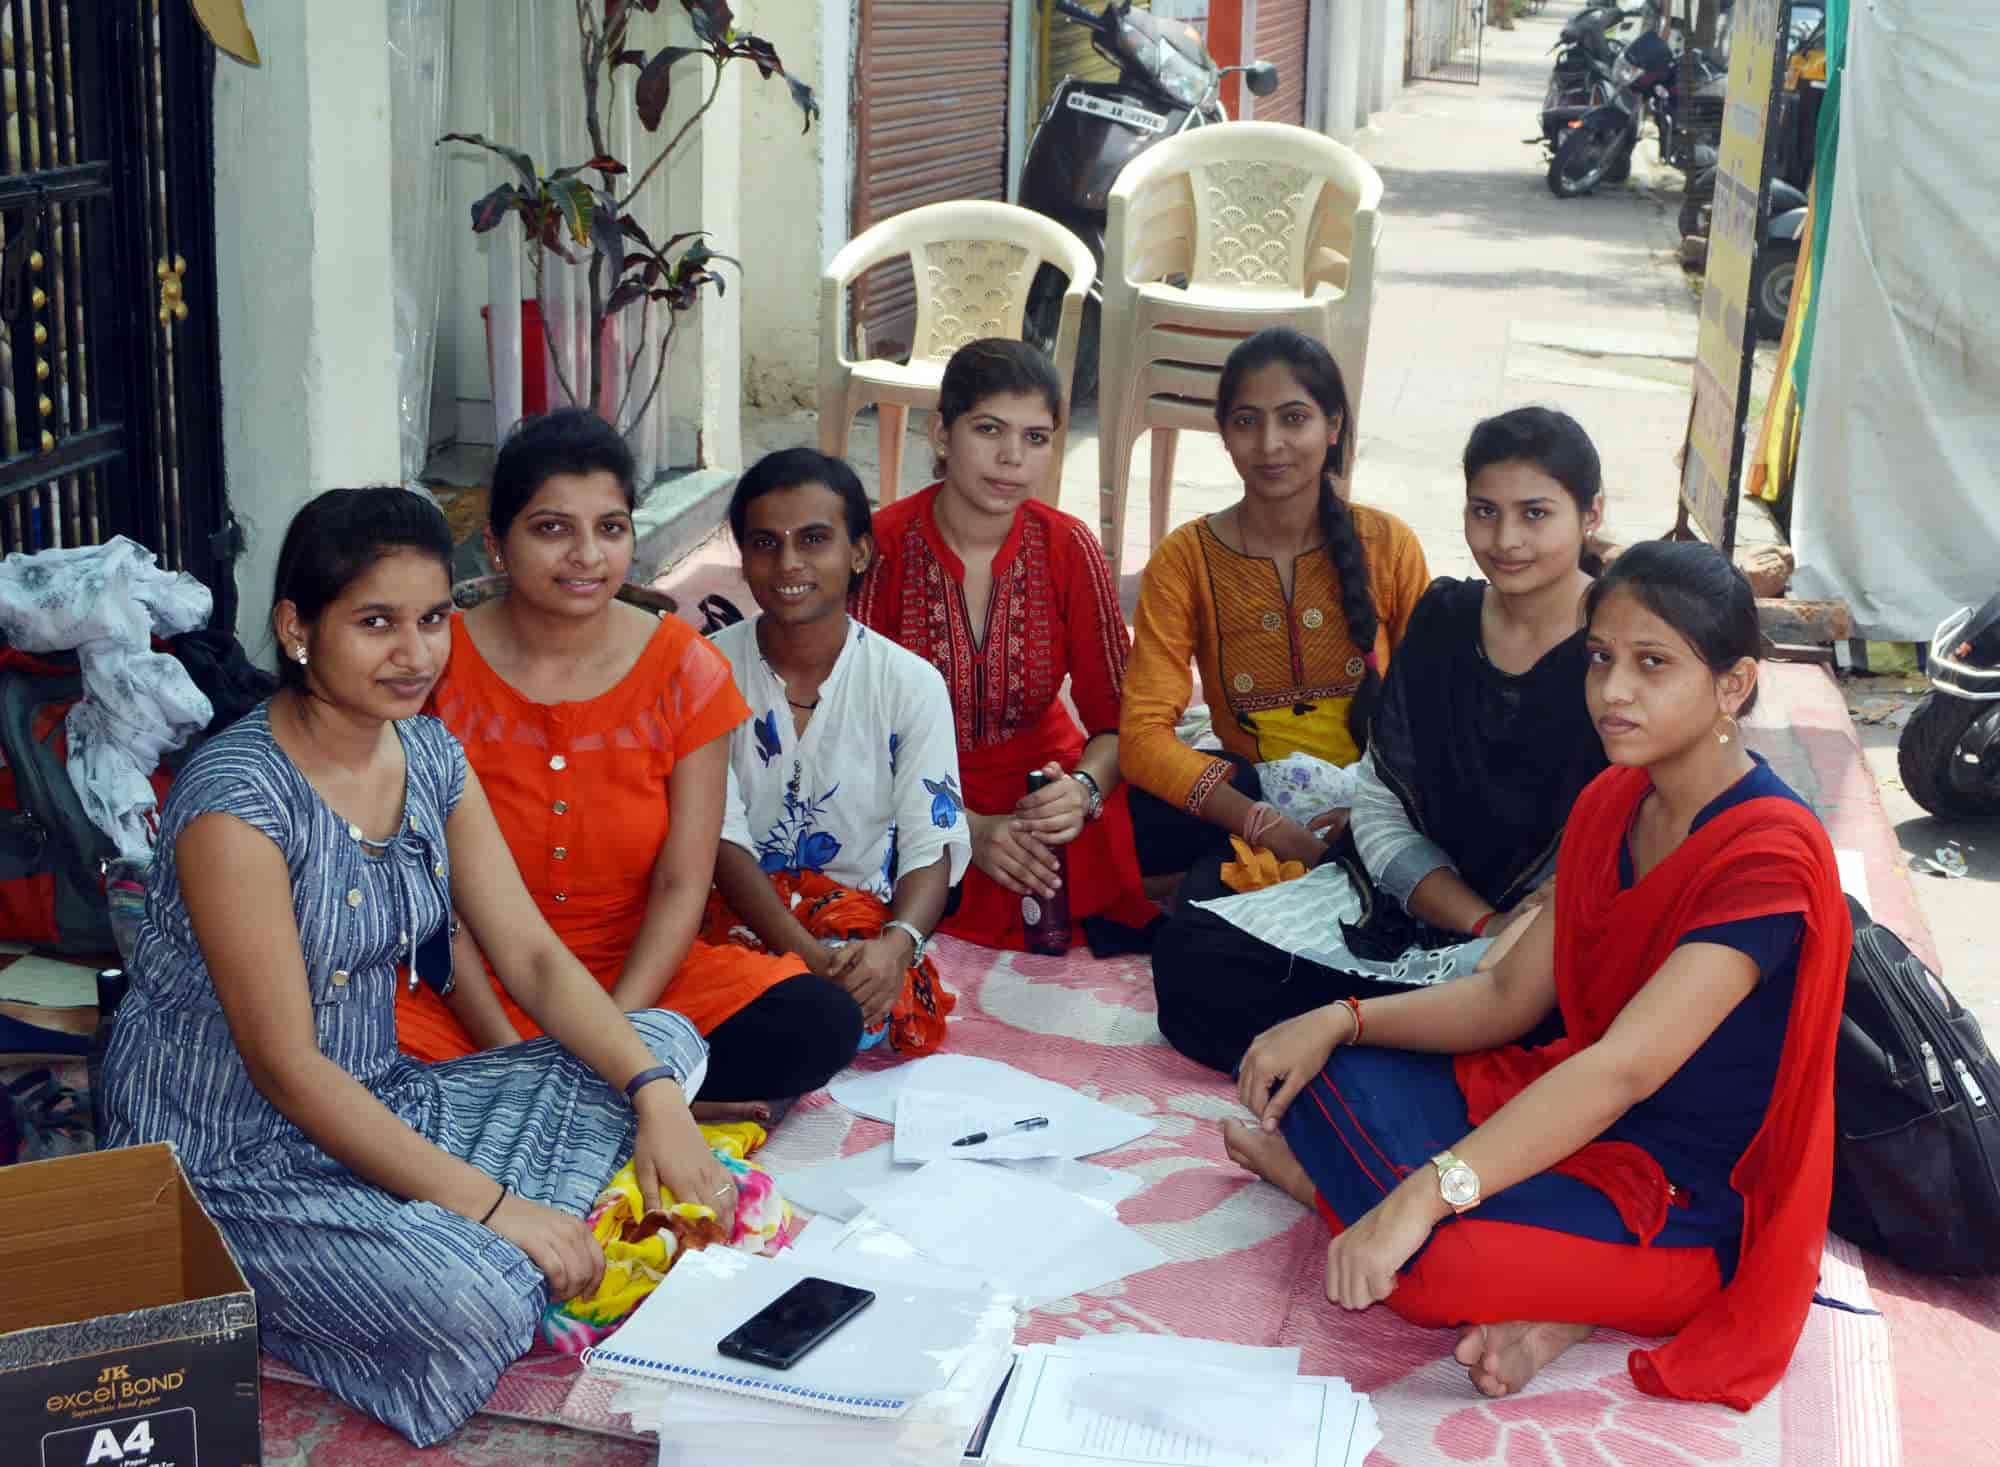 Y2k Computer Photos, Raghuji Nagar, Nagpur- Pictures